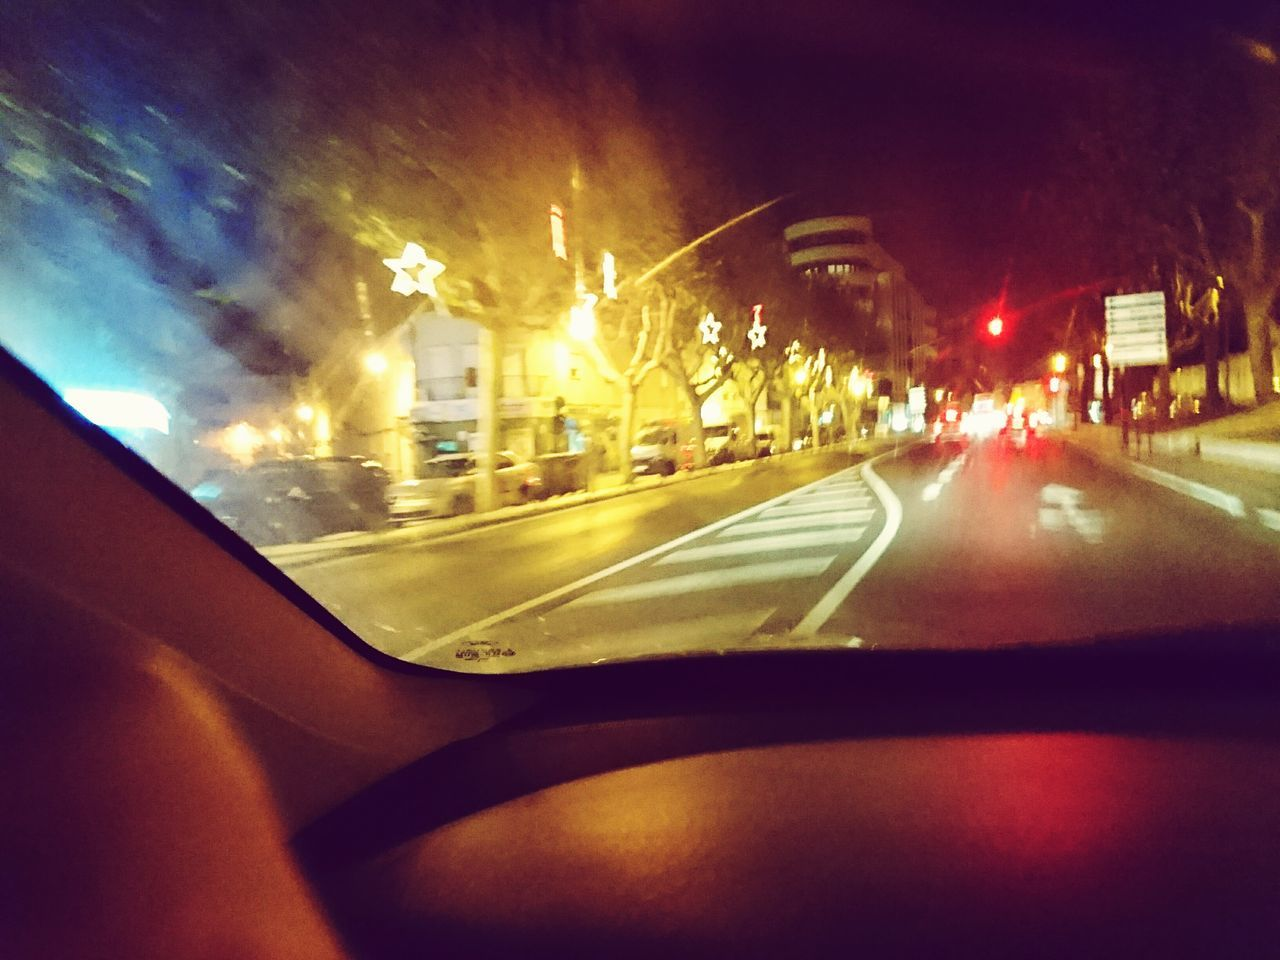 Drivebyphotography Transportation Night Car Interior Street Illuminated Road Tree City Car